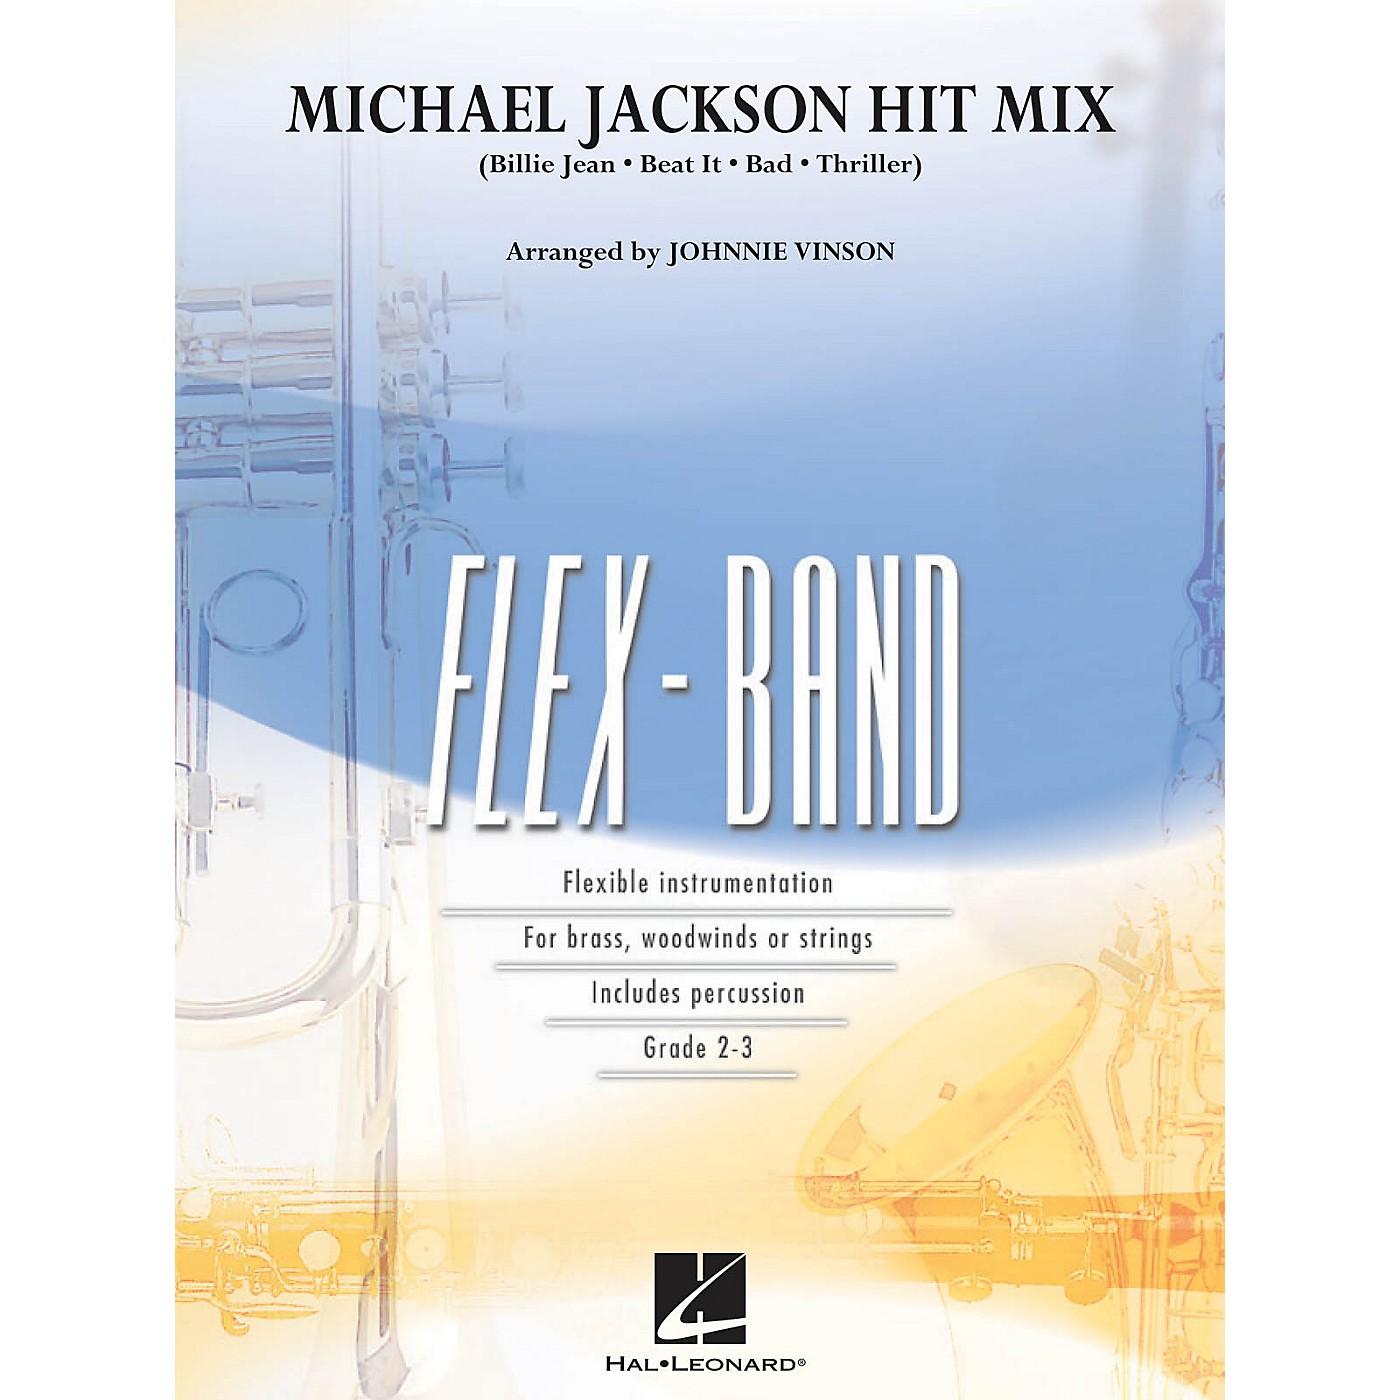 Hal Leonard Michael Jackson Hit Mix Concert Band Level 2-3 by Michael Jackson Arranged by Johnnie Vinson thumbnail